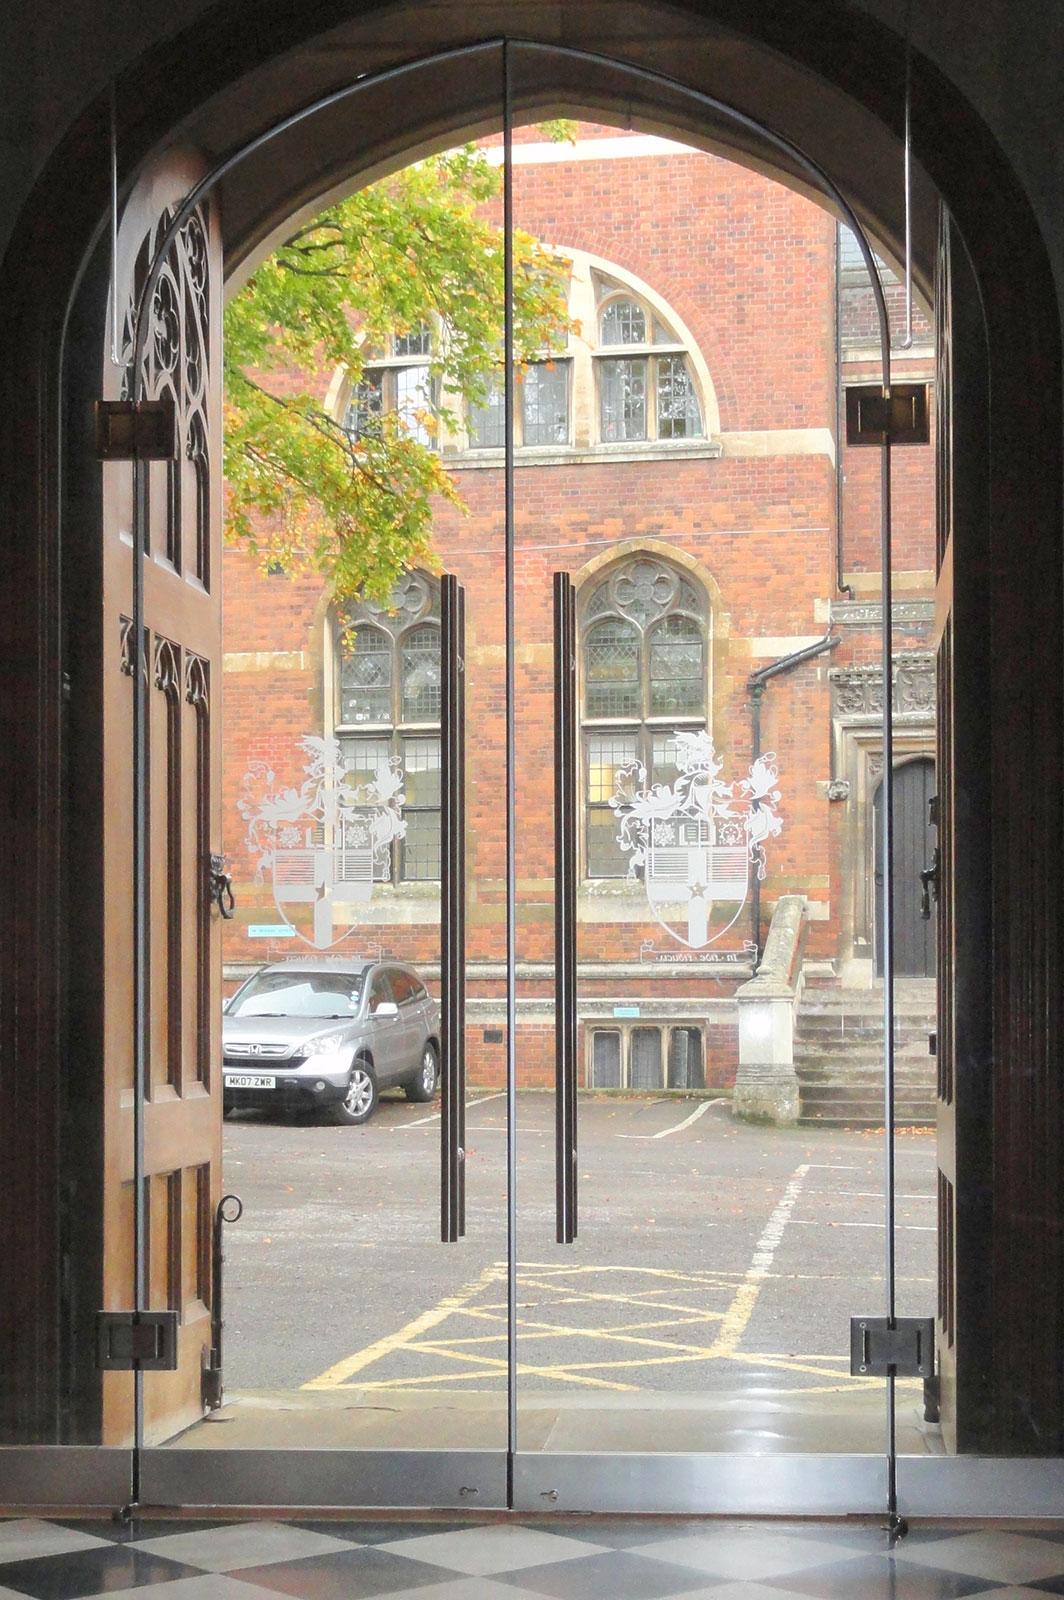 External Arched Glass Doors at Leys School Cambridge